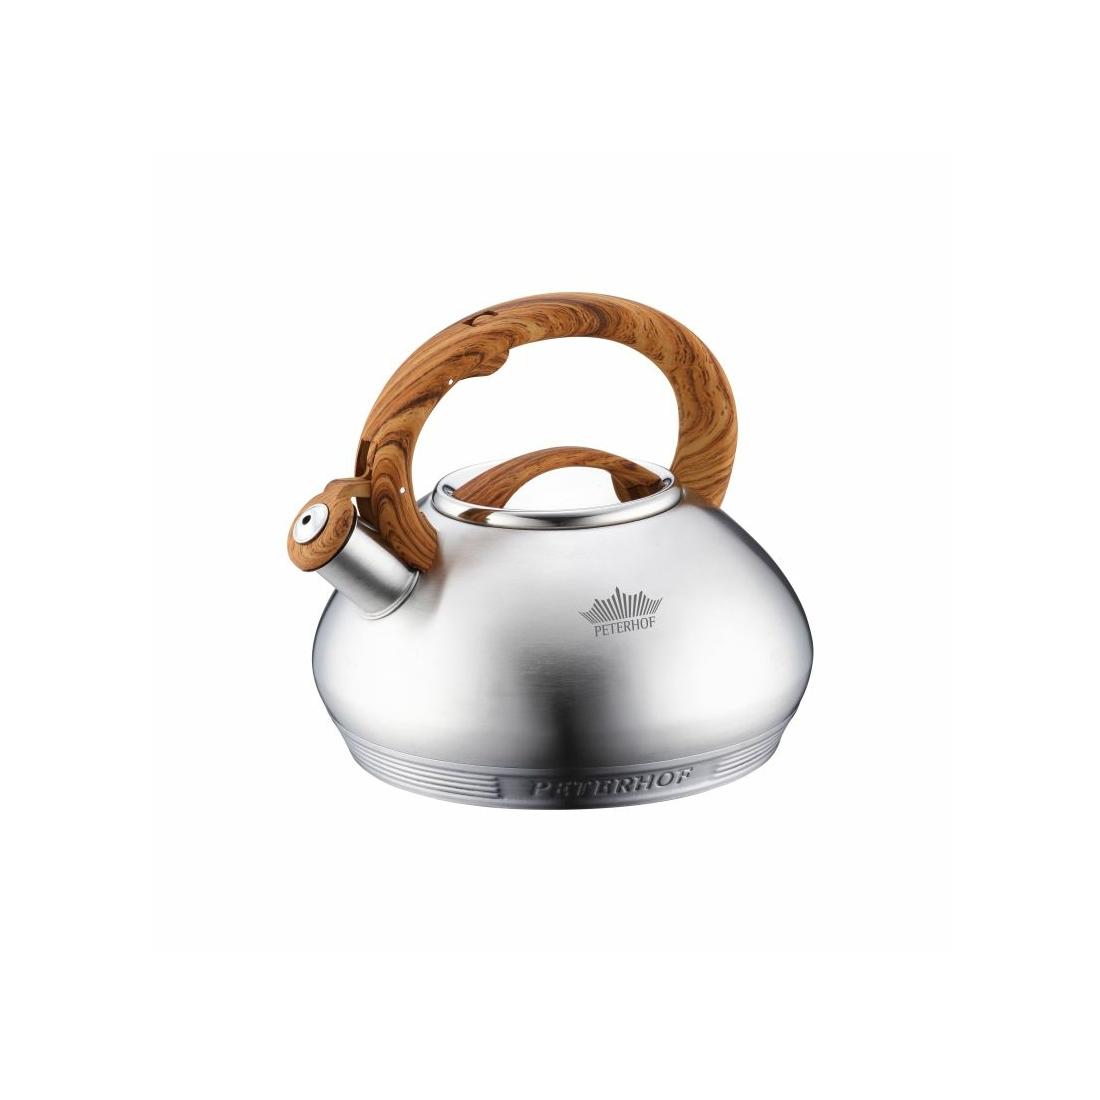 Peterhof 3 literes teafőző